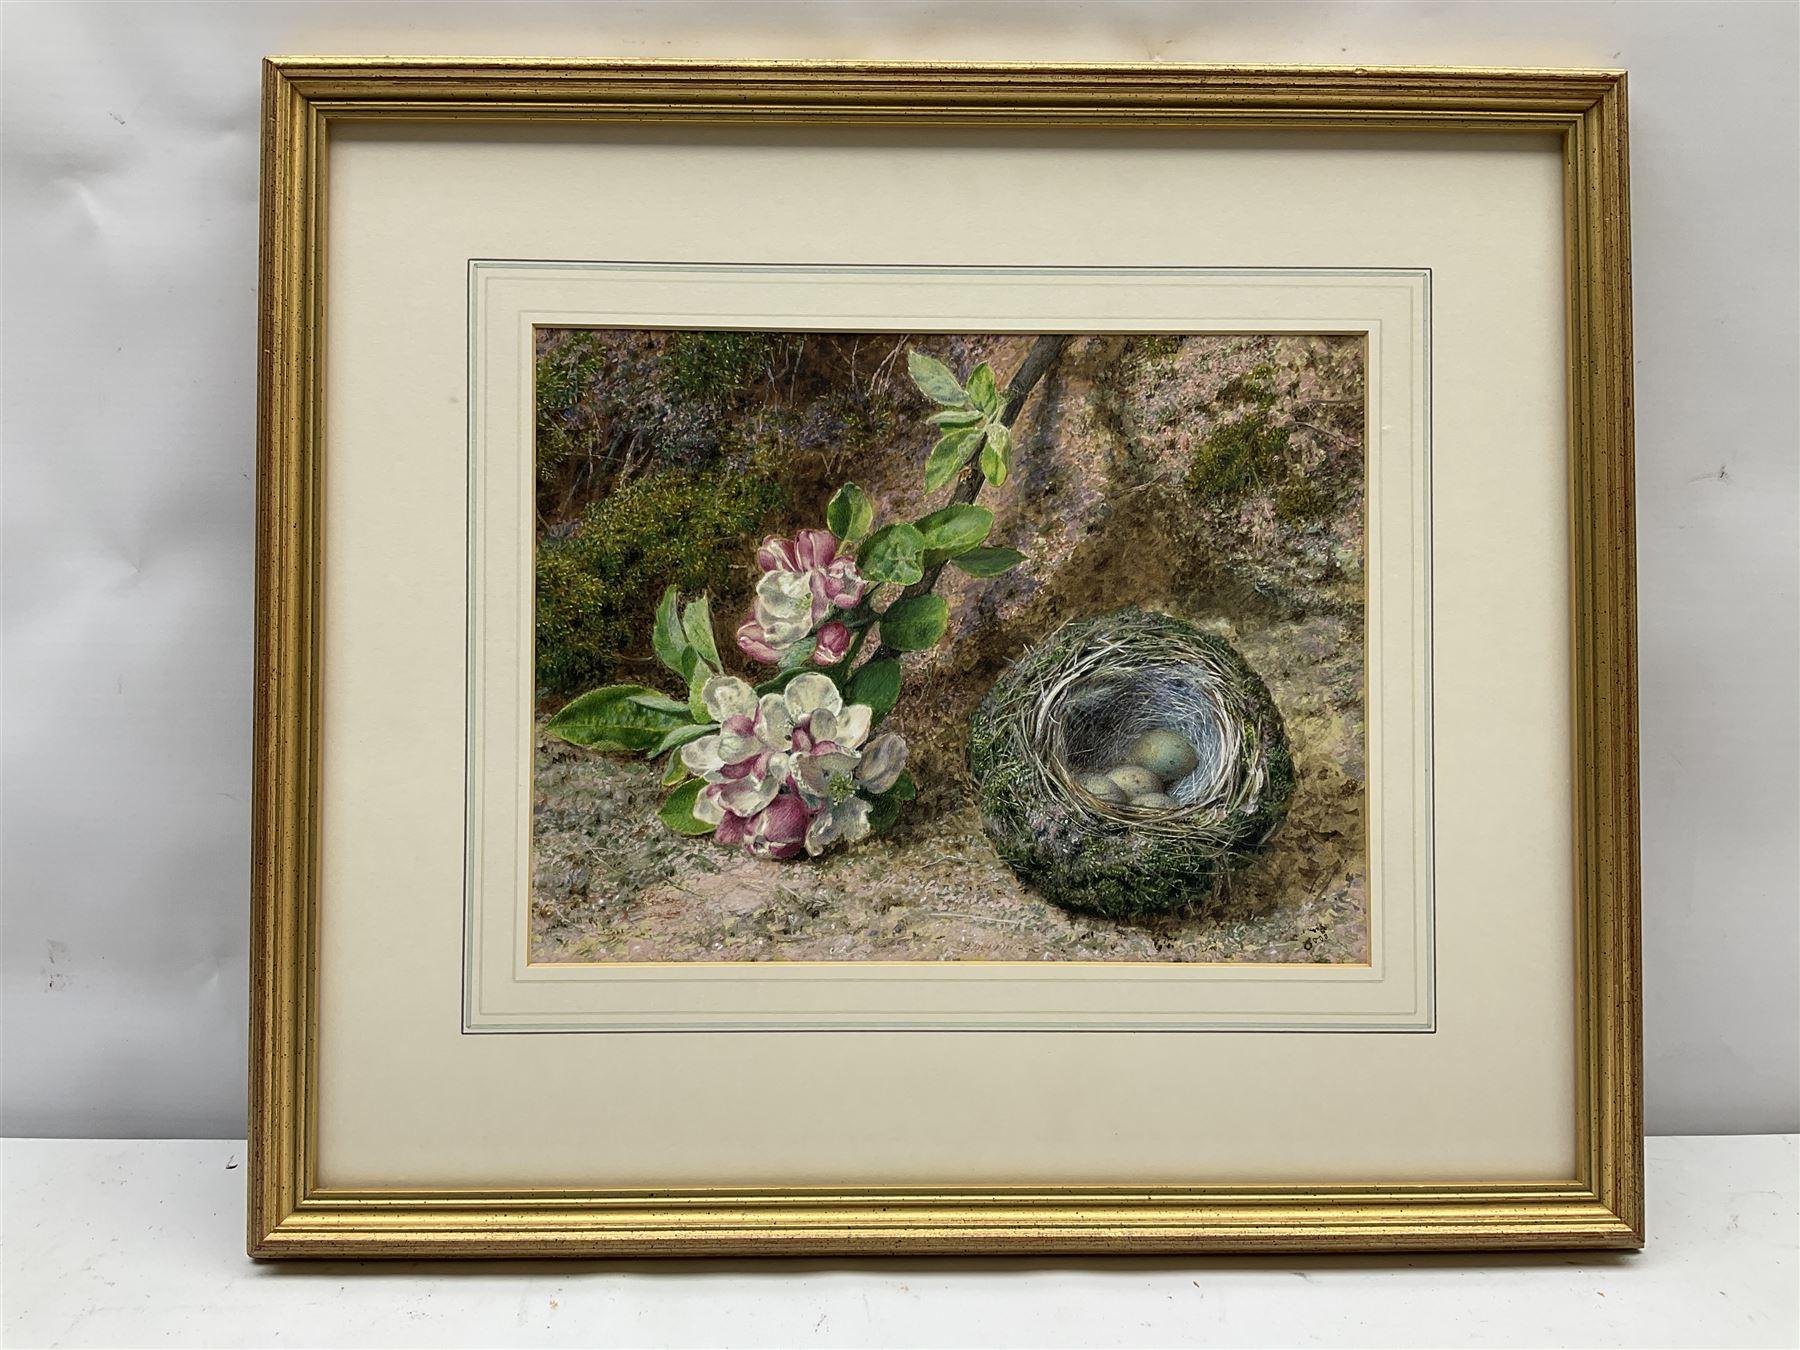 John Sherrin (British 1819-1896): Apple Blossom and Birds Nest on a Mossy Bank - Image 2 of 4